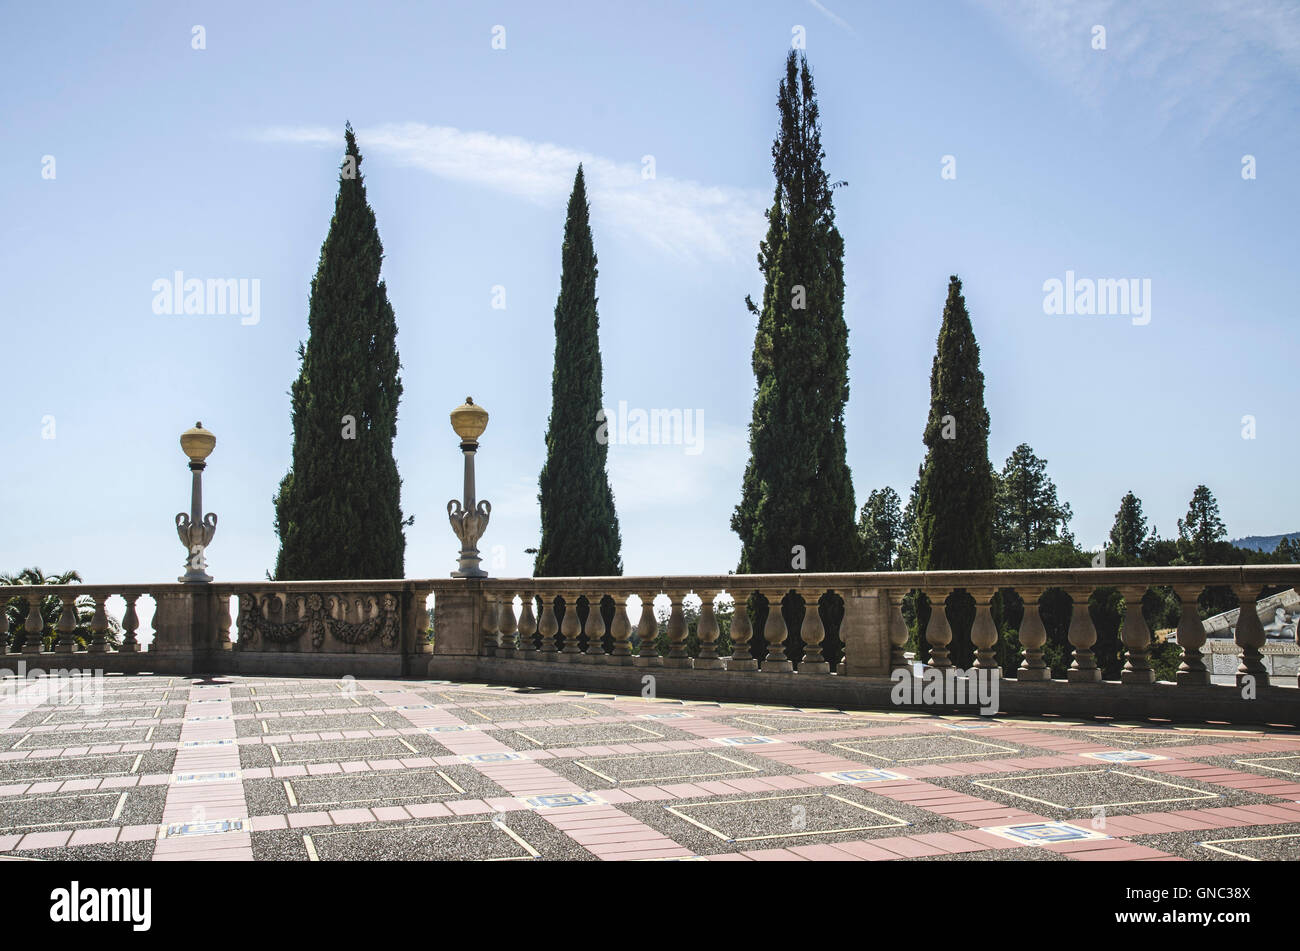 Terrace and Balustrade against Tall Trees, Hearst Castle, San Simeon, California, USA - Stock Image